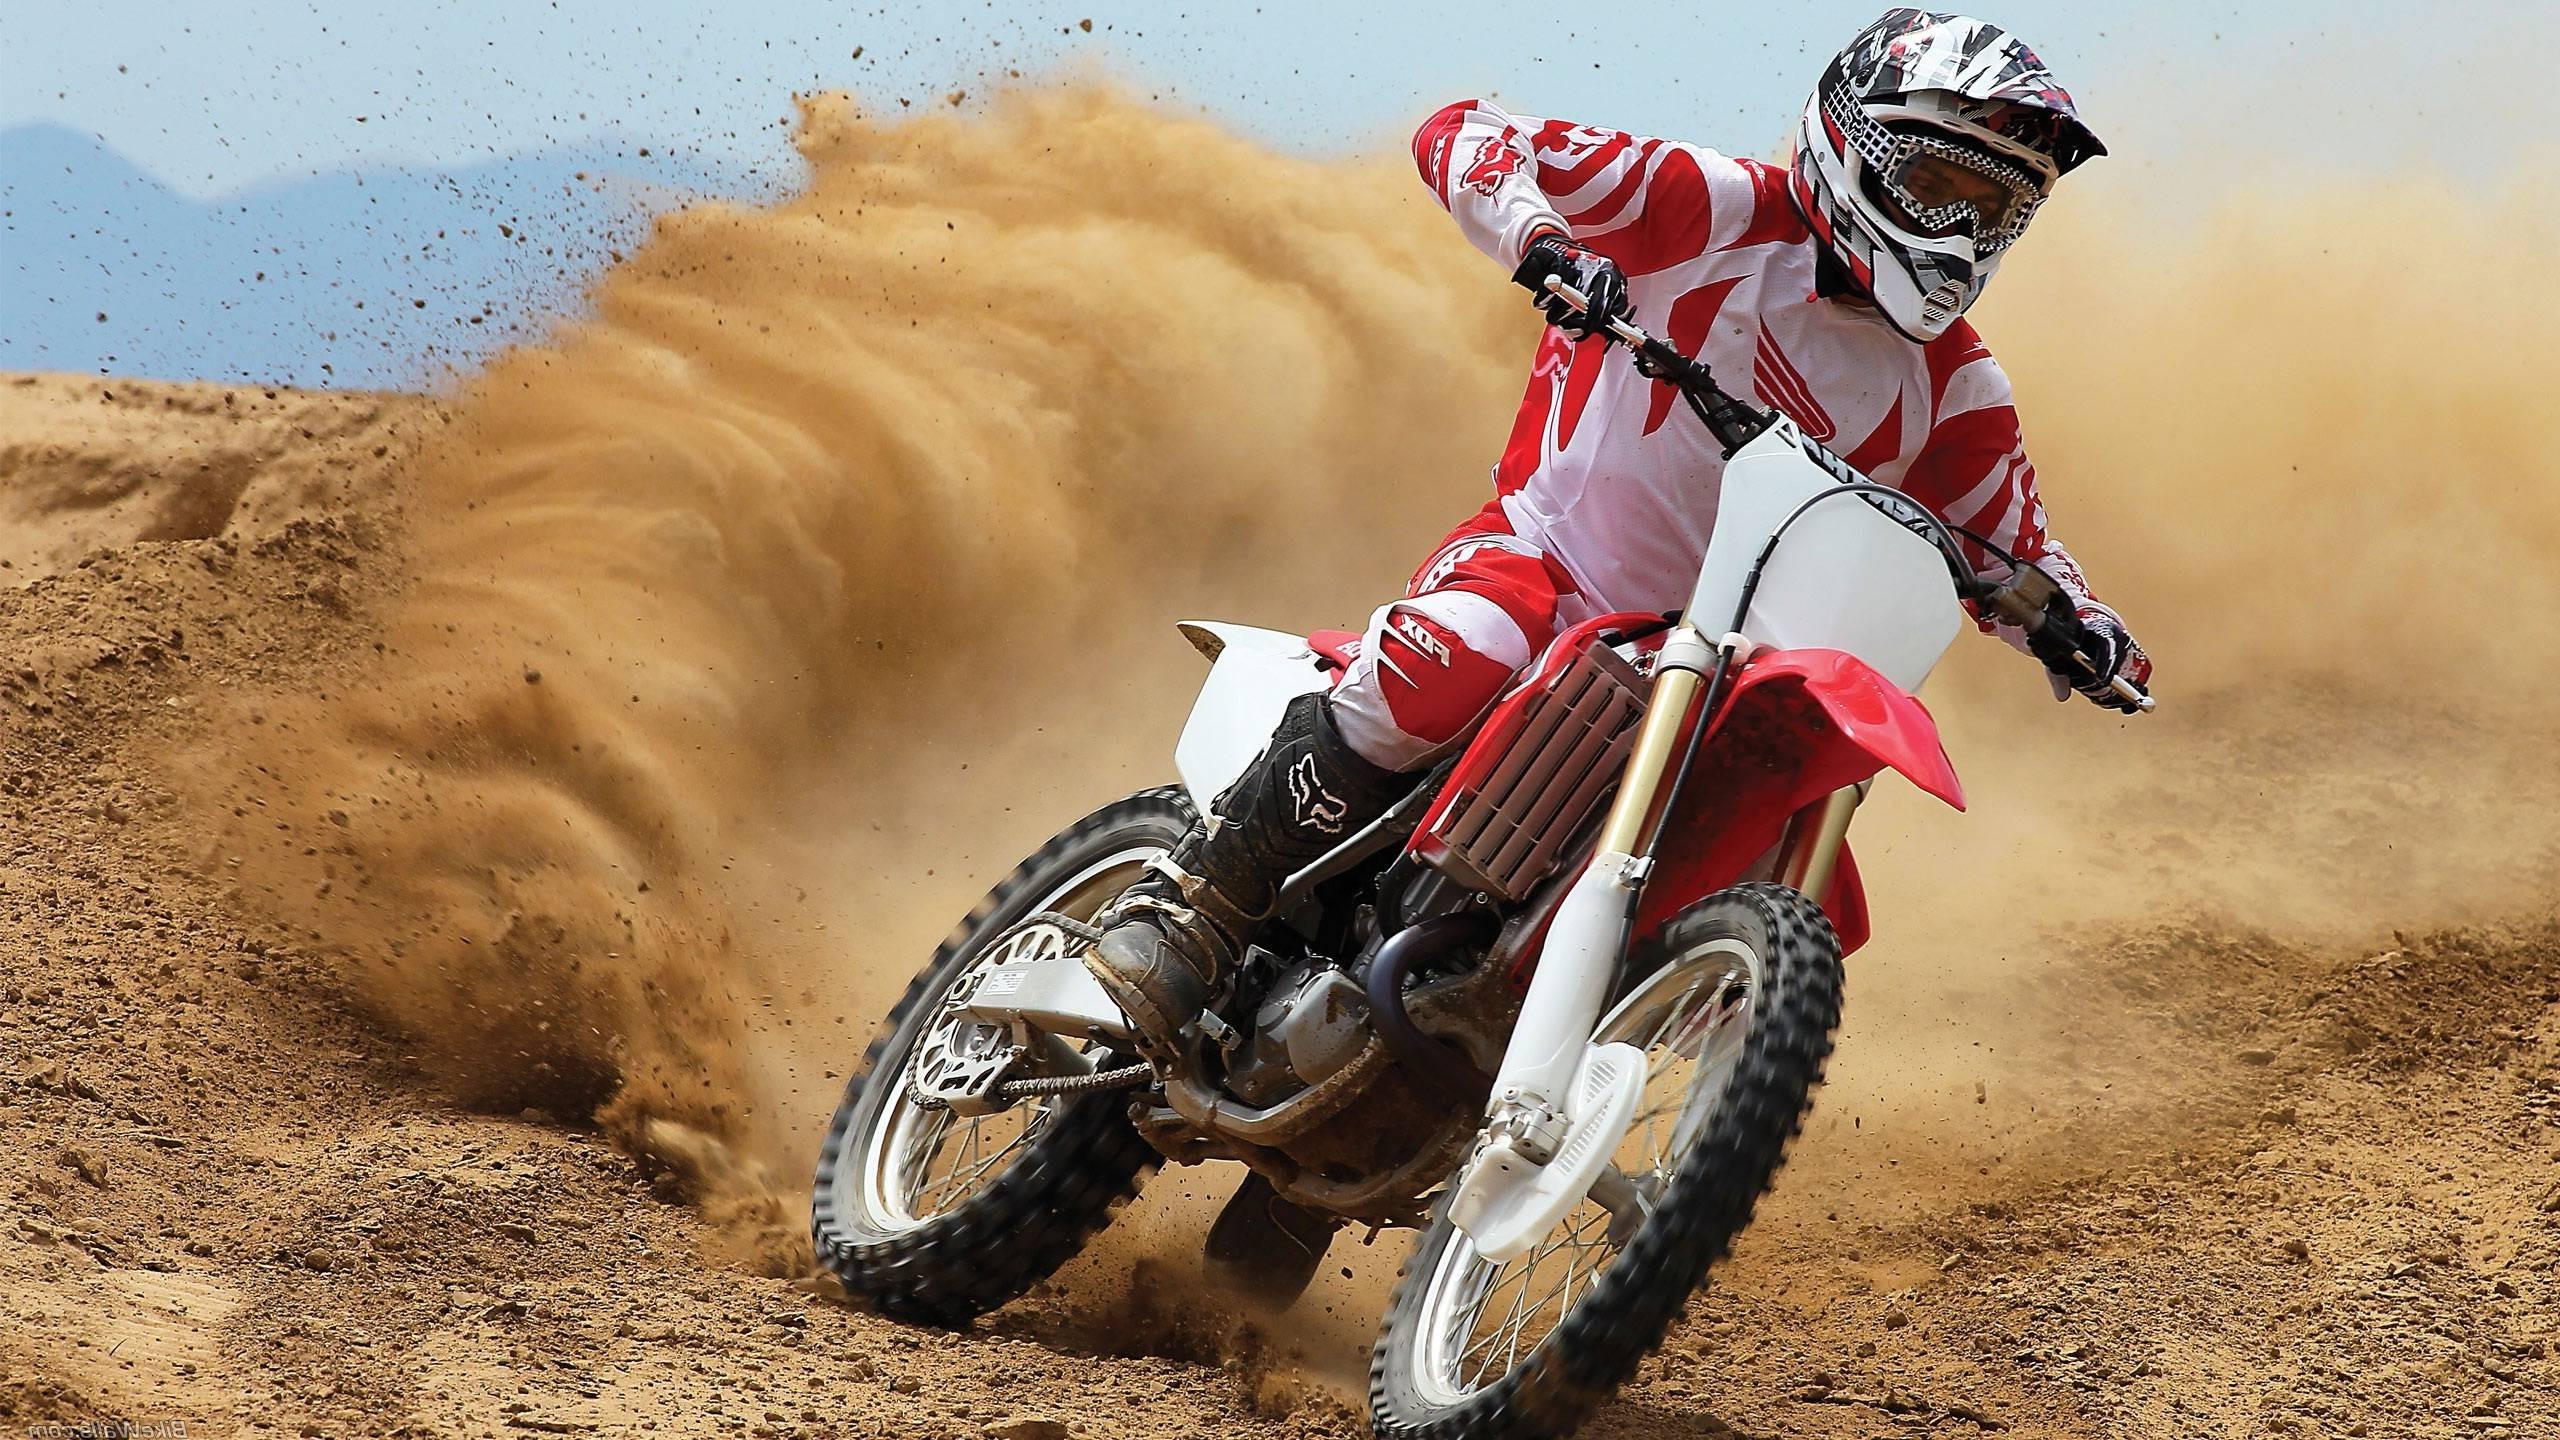 Sports Vehicle Honda Motocross Racing Cr Motorsport 2560x1440 Px Soil Extreme Sport Freestyle Dirt